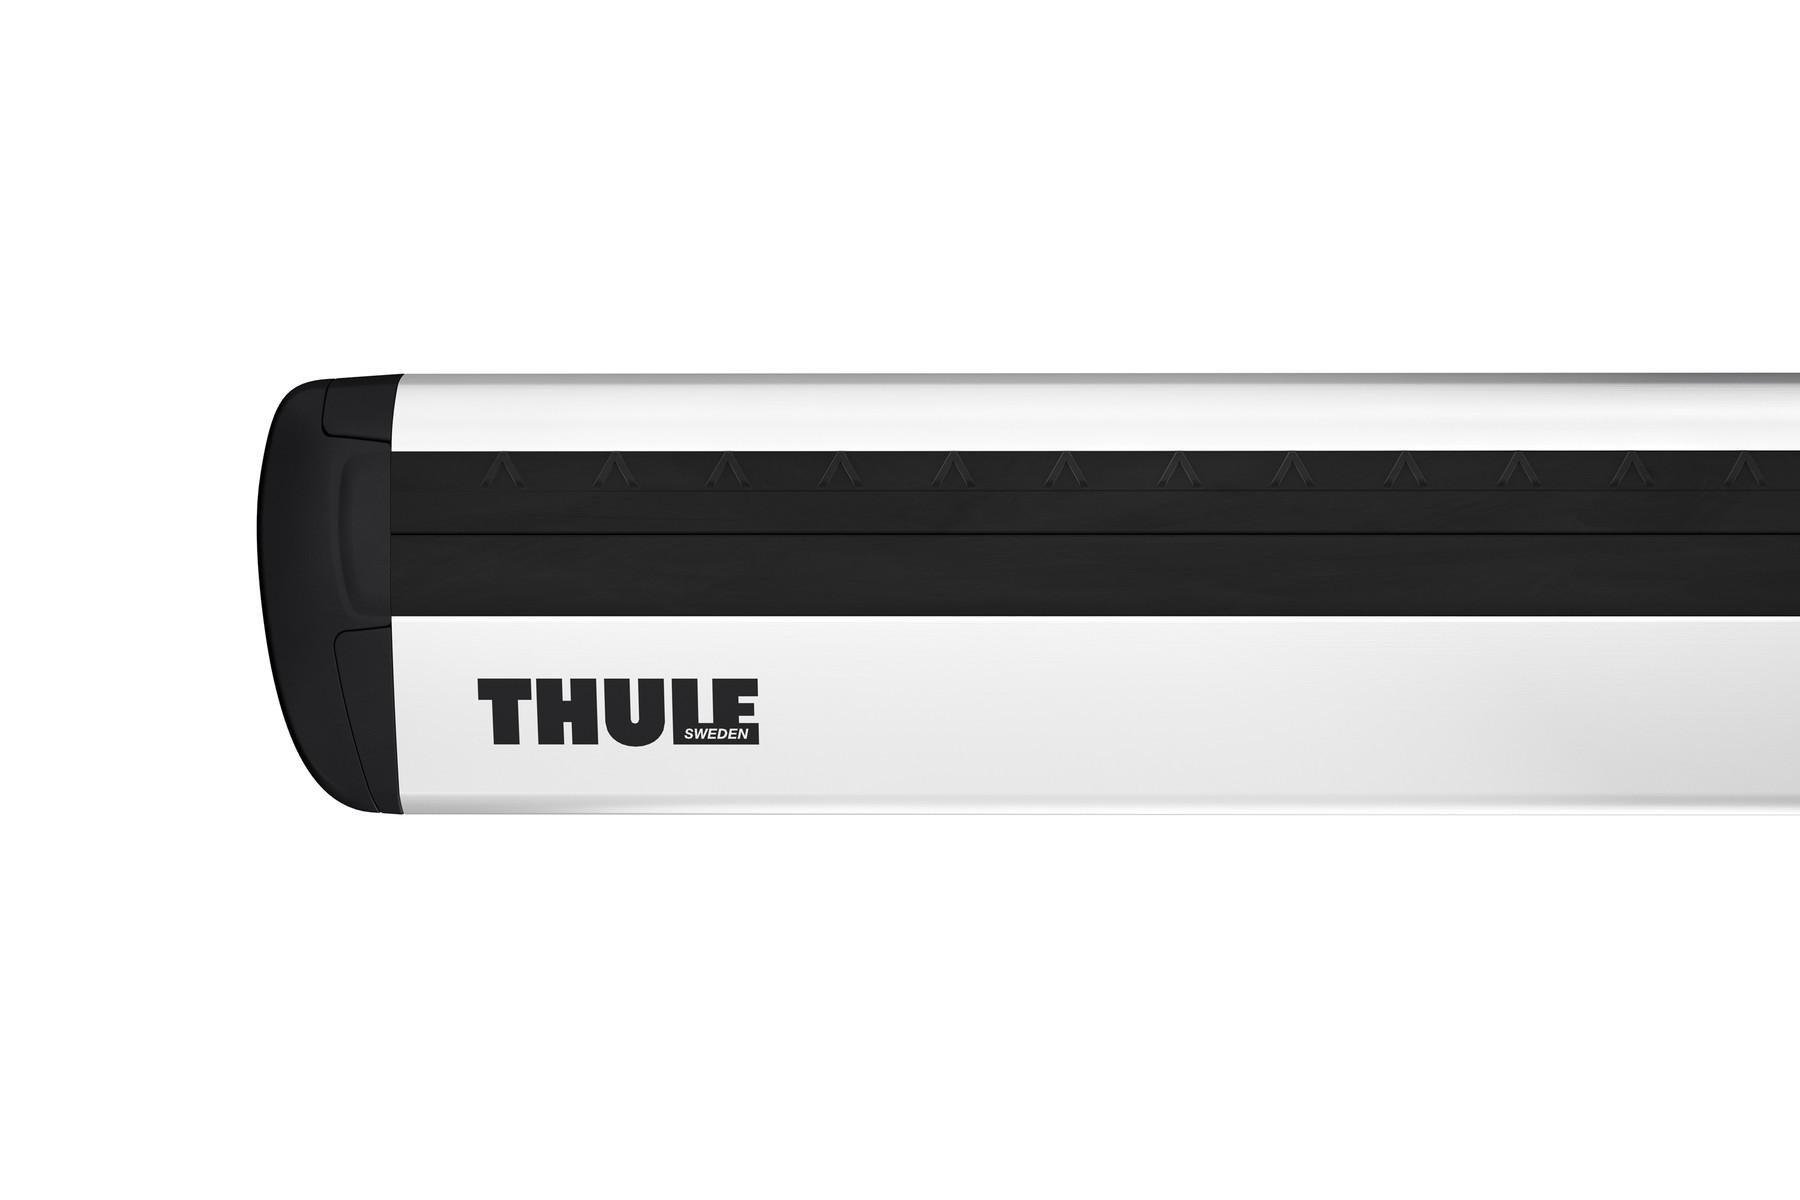 Barra Thule Aluminio WingBar Evo 135cm (7114) Thule 2 Barras